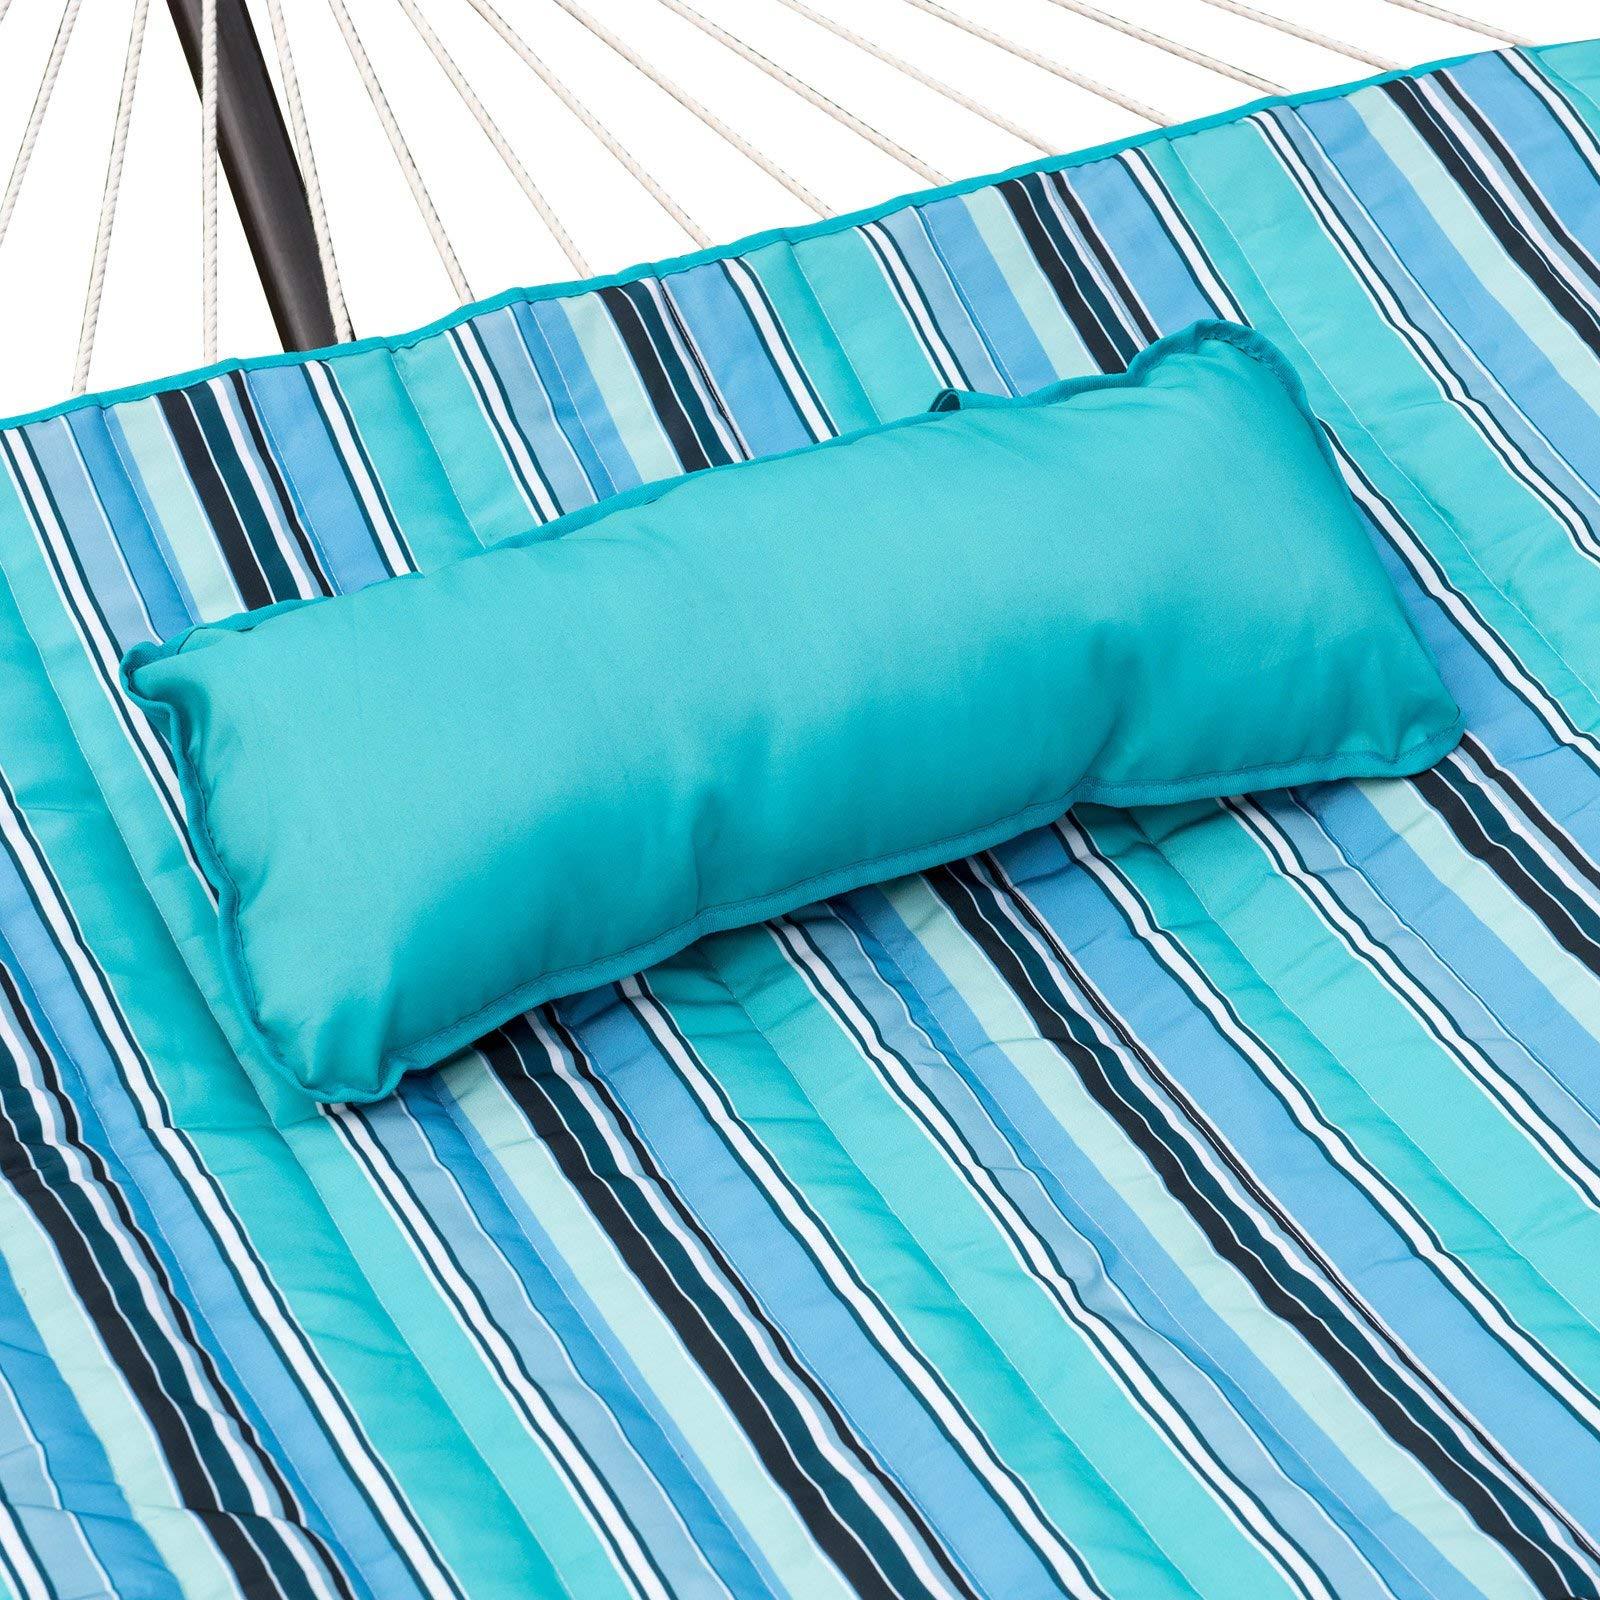 Jur_Global Blue Wave Island Retreat Hammock Pillow and Pad Set